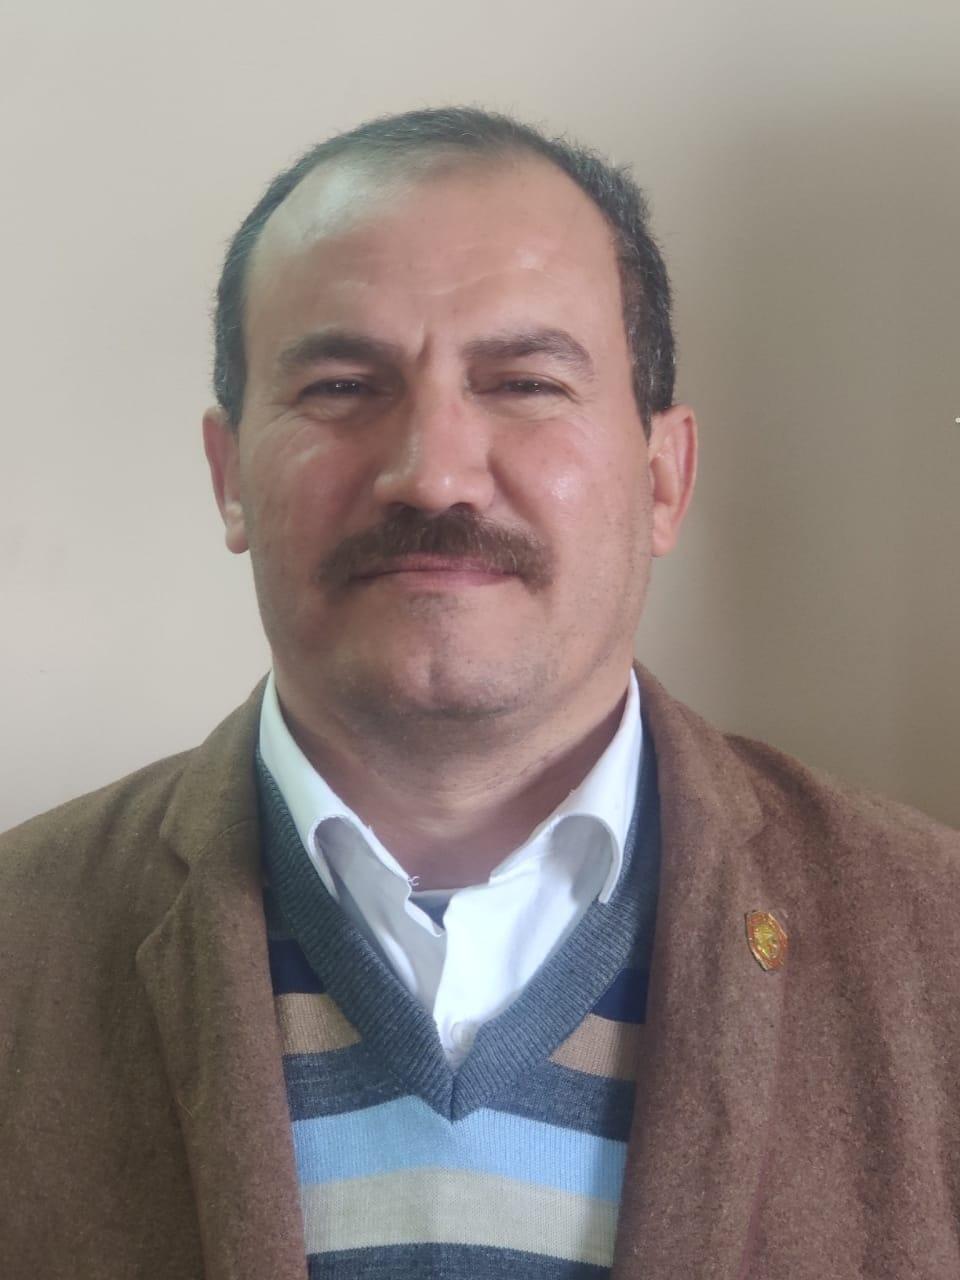 khairy_abdelsaid